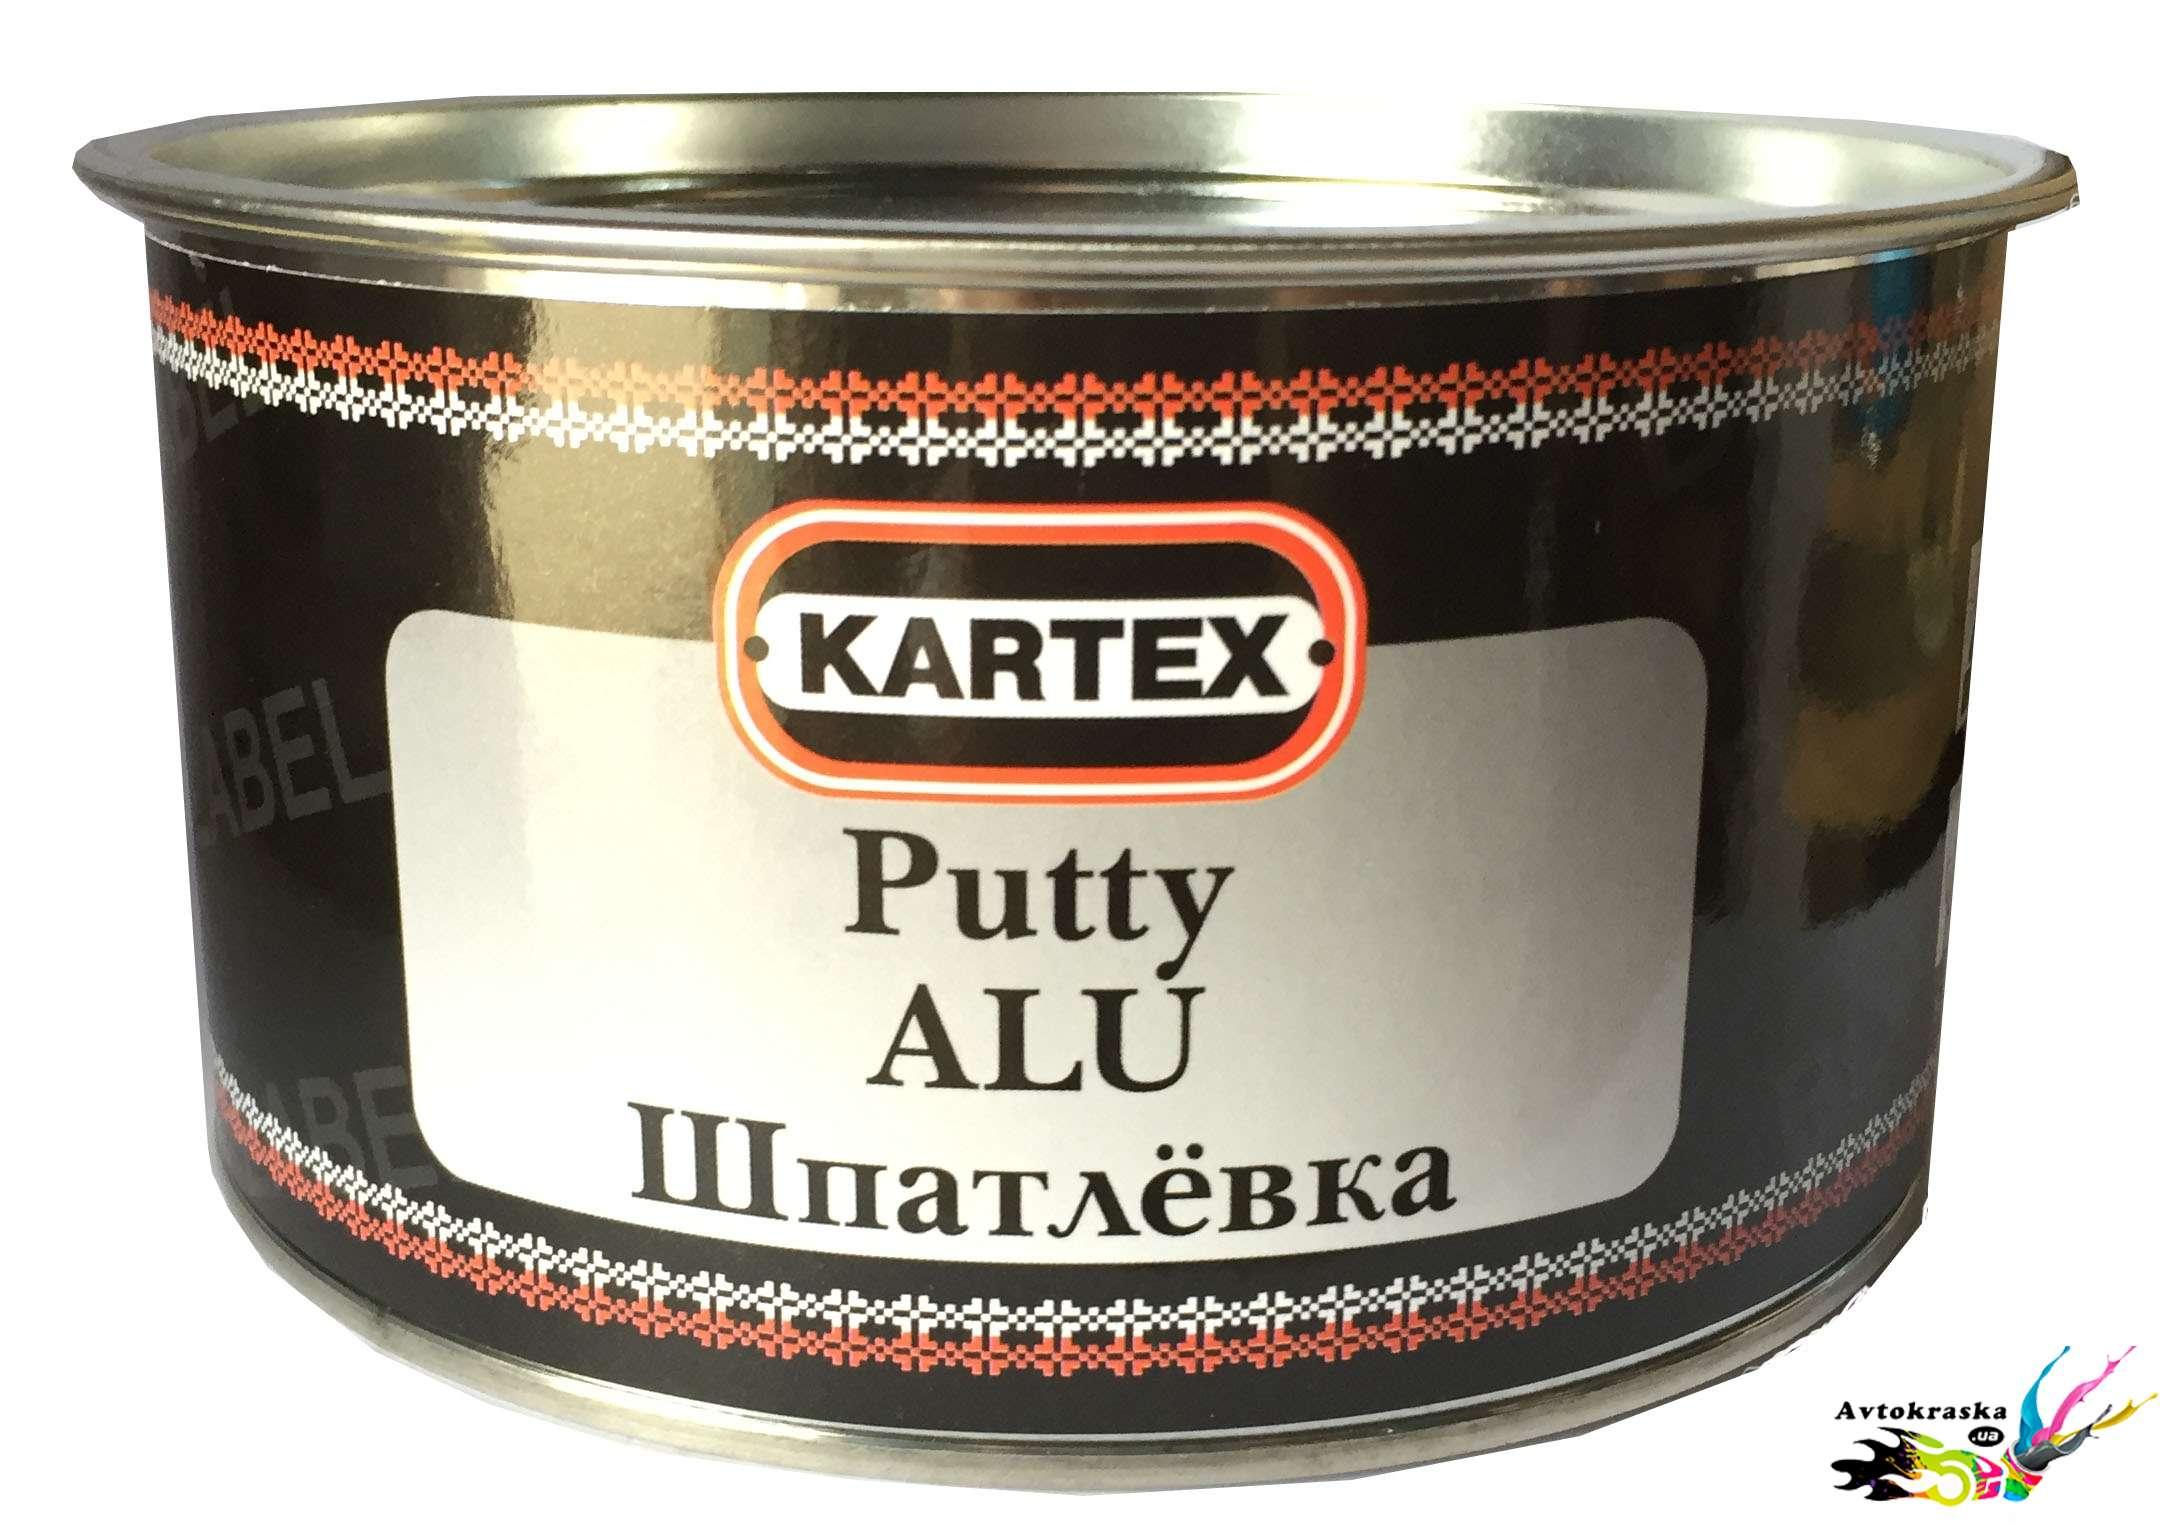 Kartex Шпатлевка с алюминием BL 0,5 кг